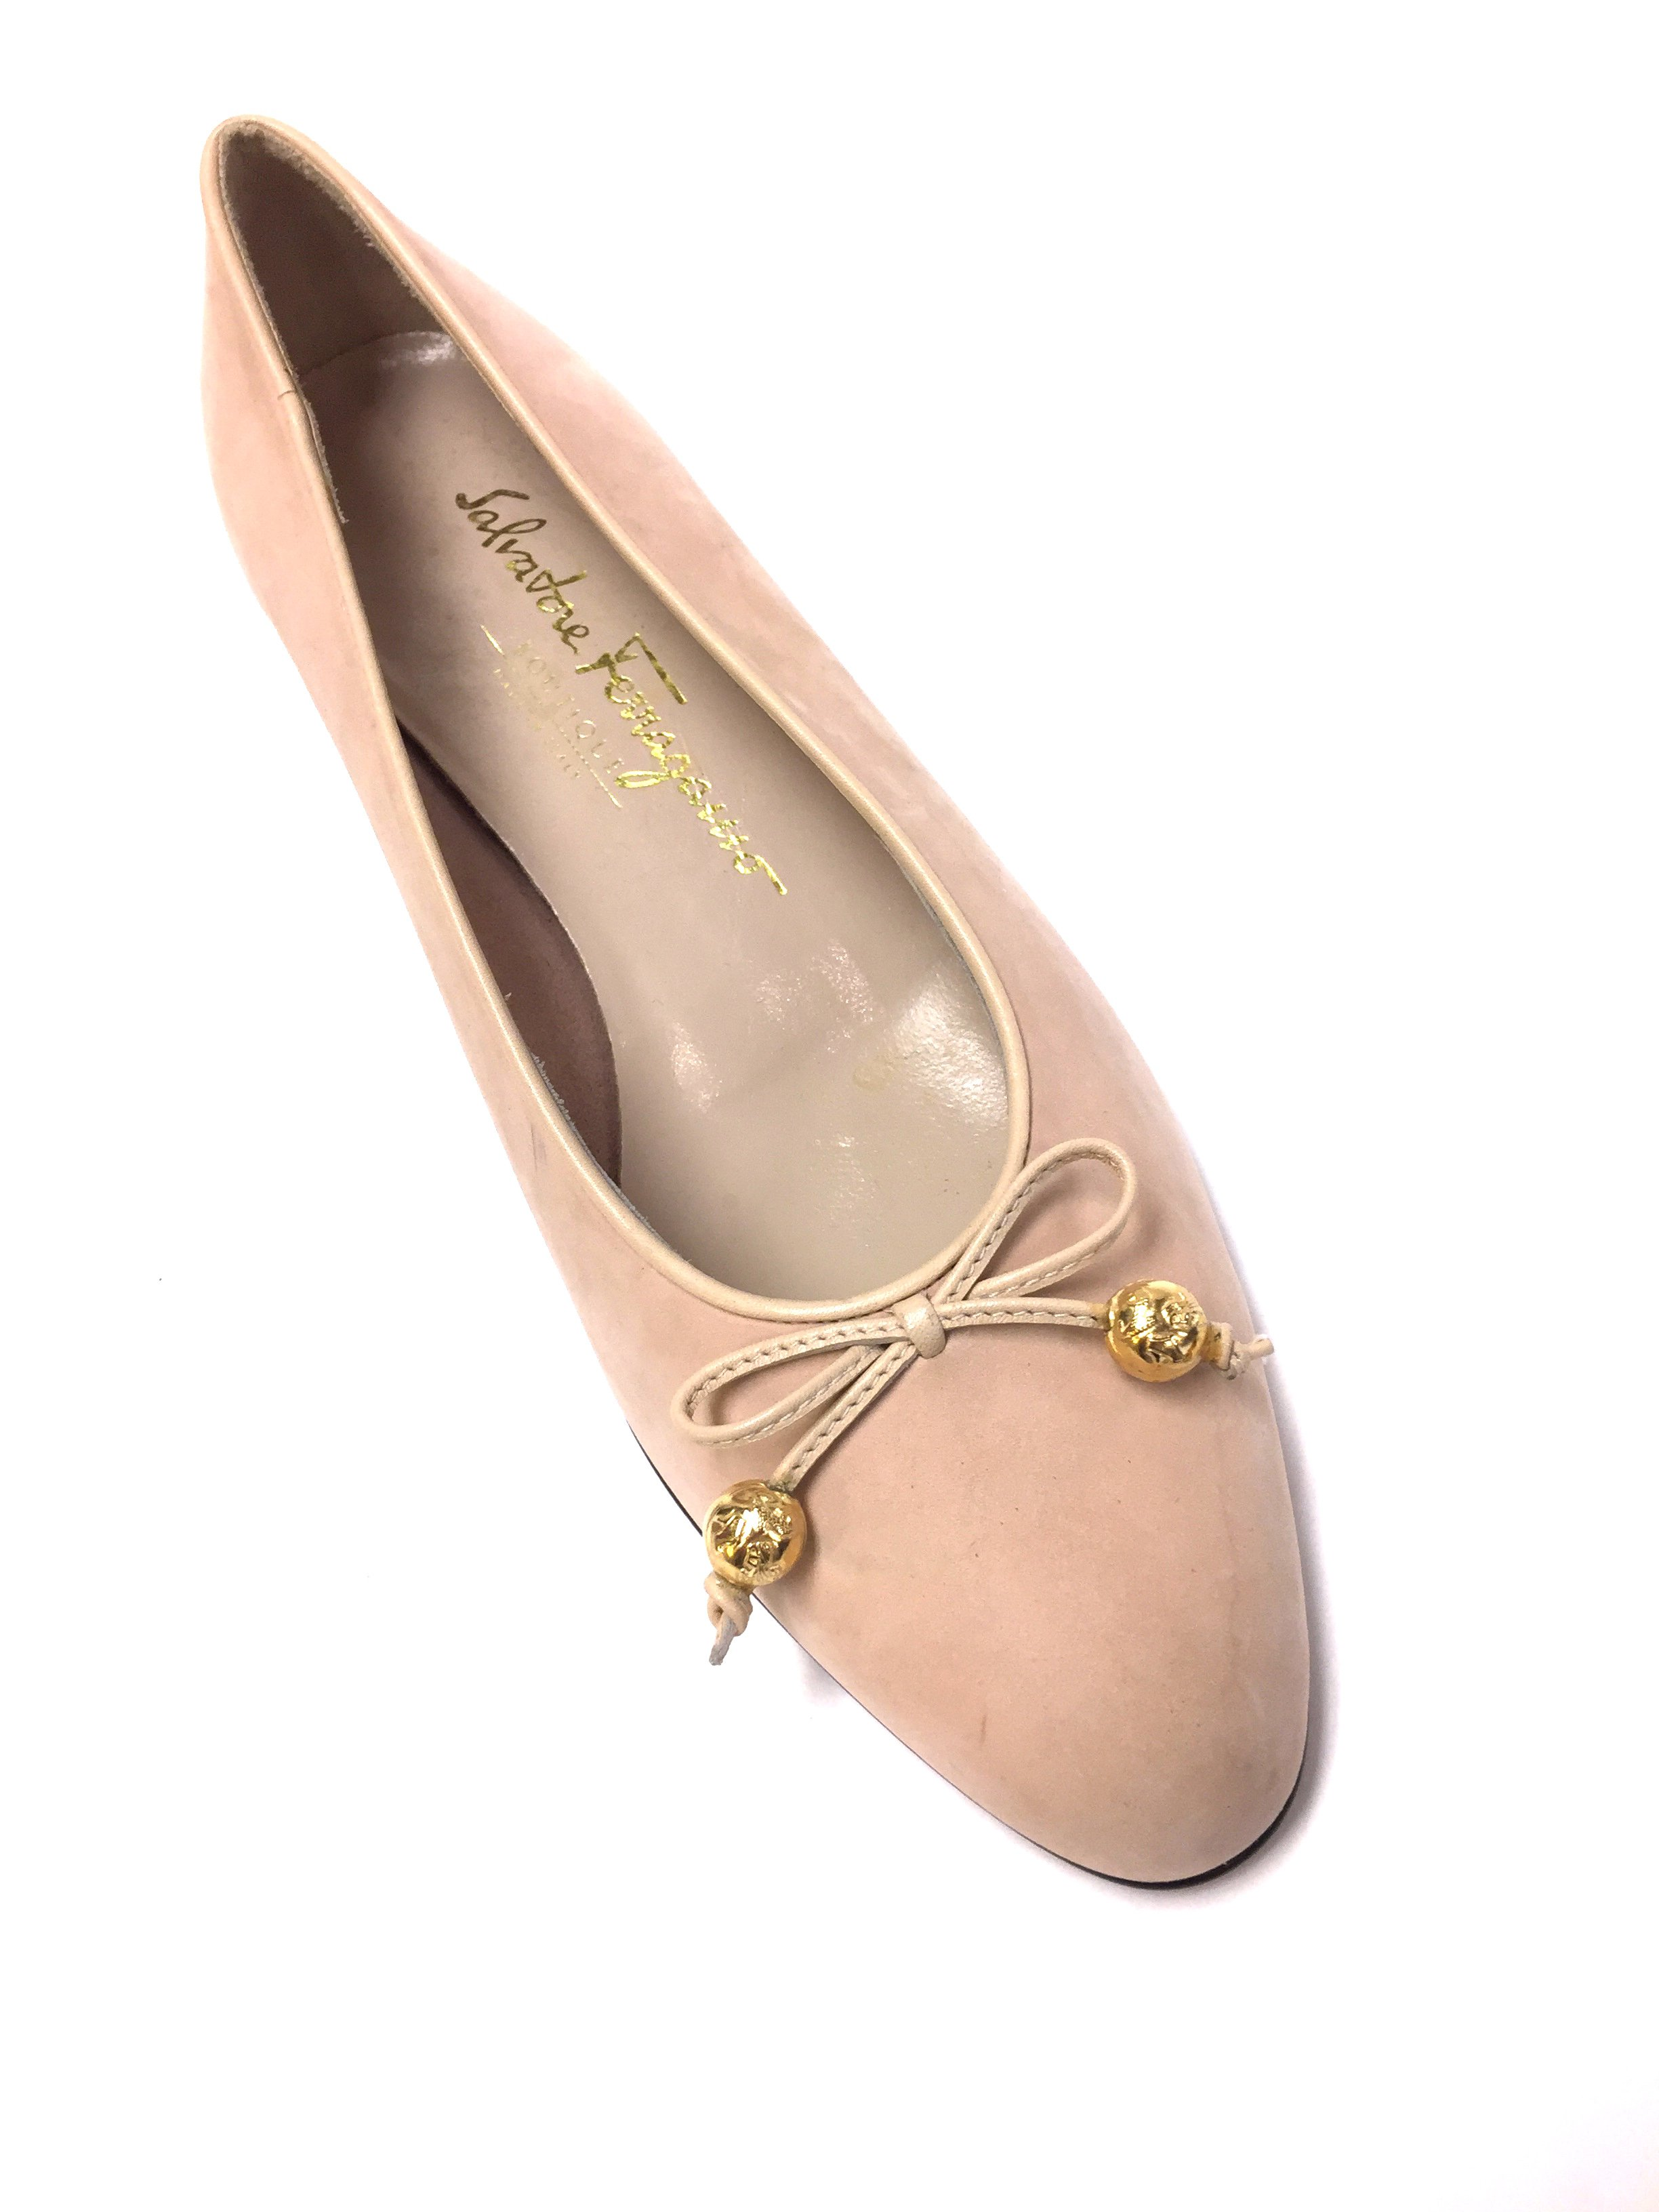 b91feef464a6 SALVATORE FERRAGAMO Blush-Pink Suede Ballet Flats Shoes Size  6.5M ...